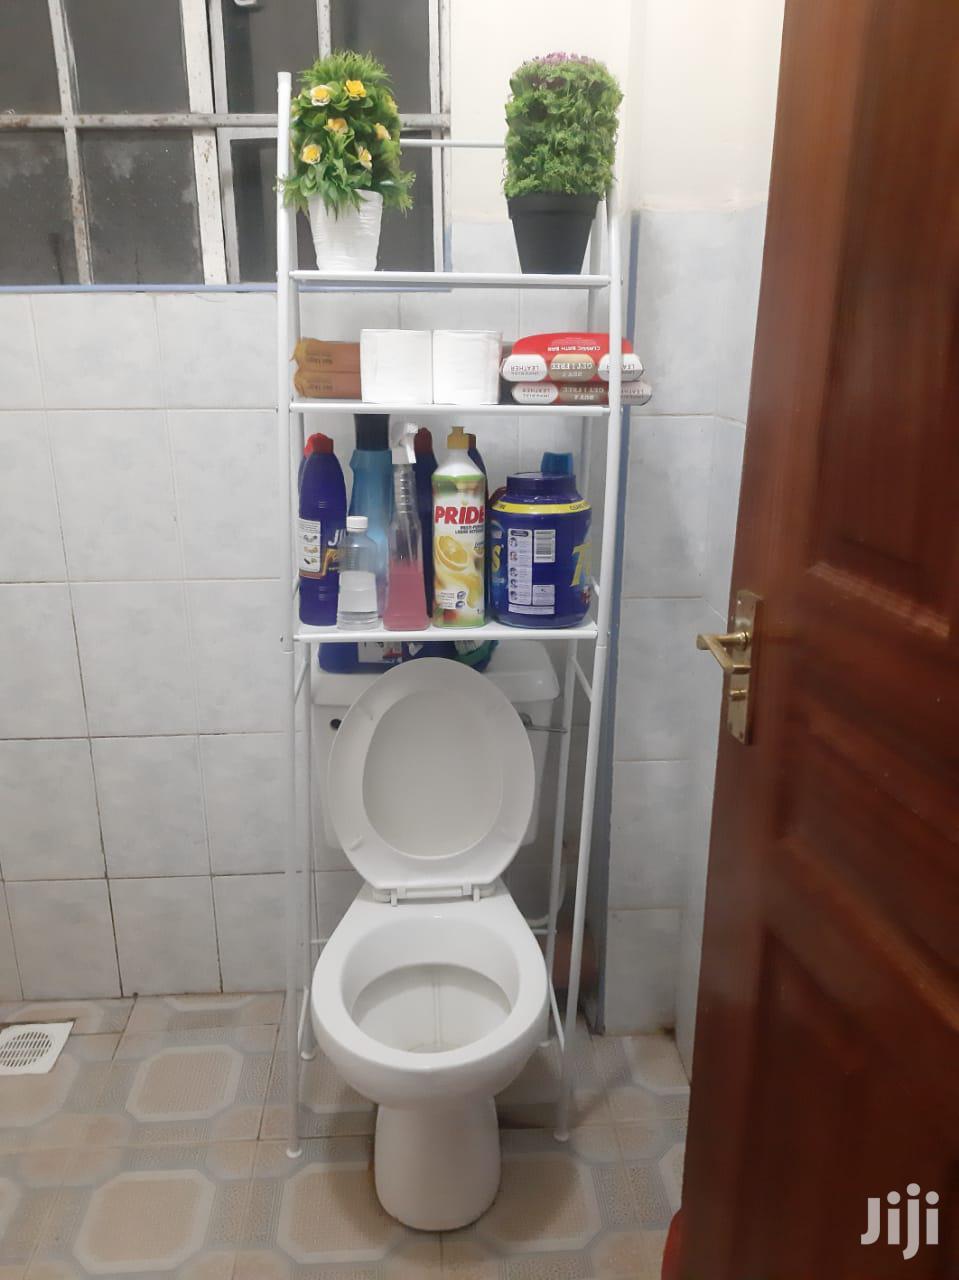 Bathroom Organisers